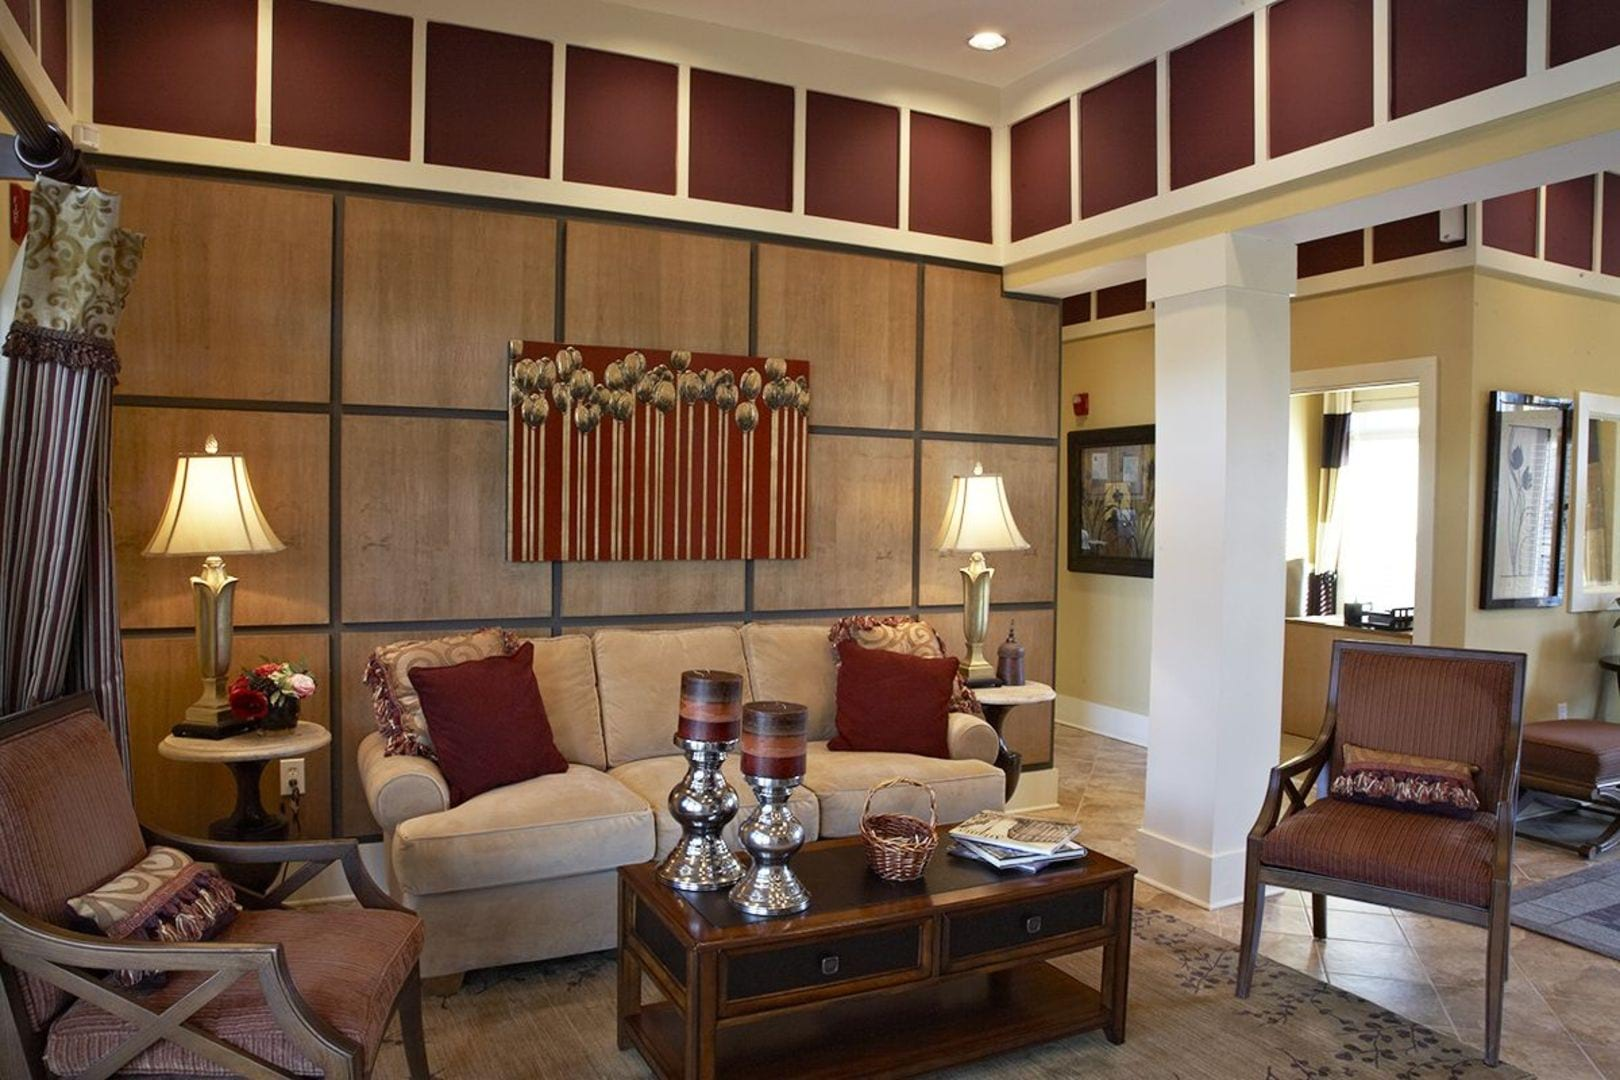 Apartments for Rent in Atlanta, GA | Avalon Ridge - Home